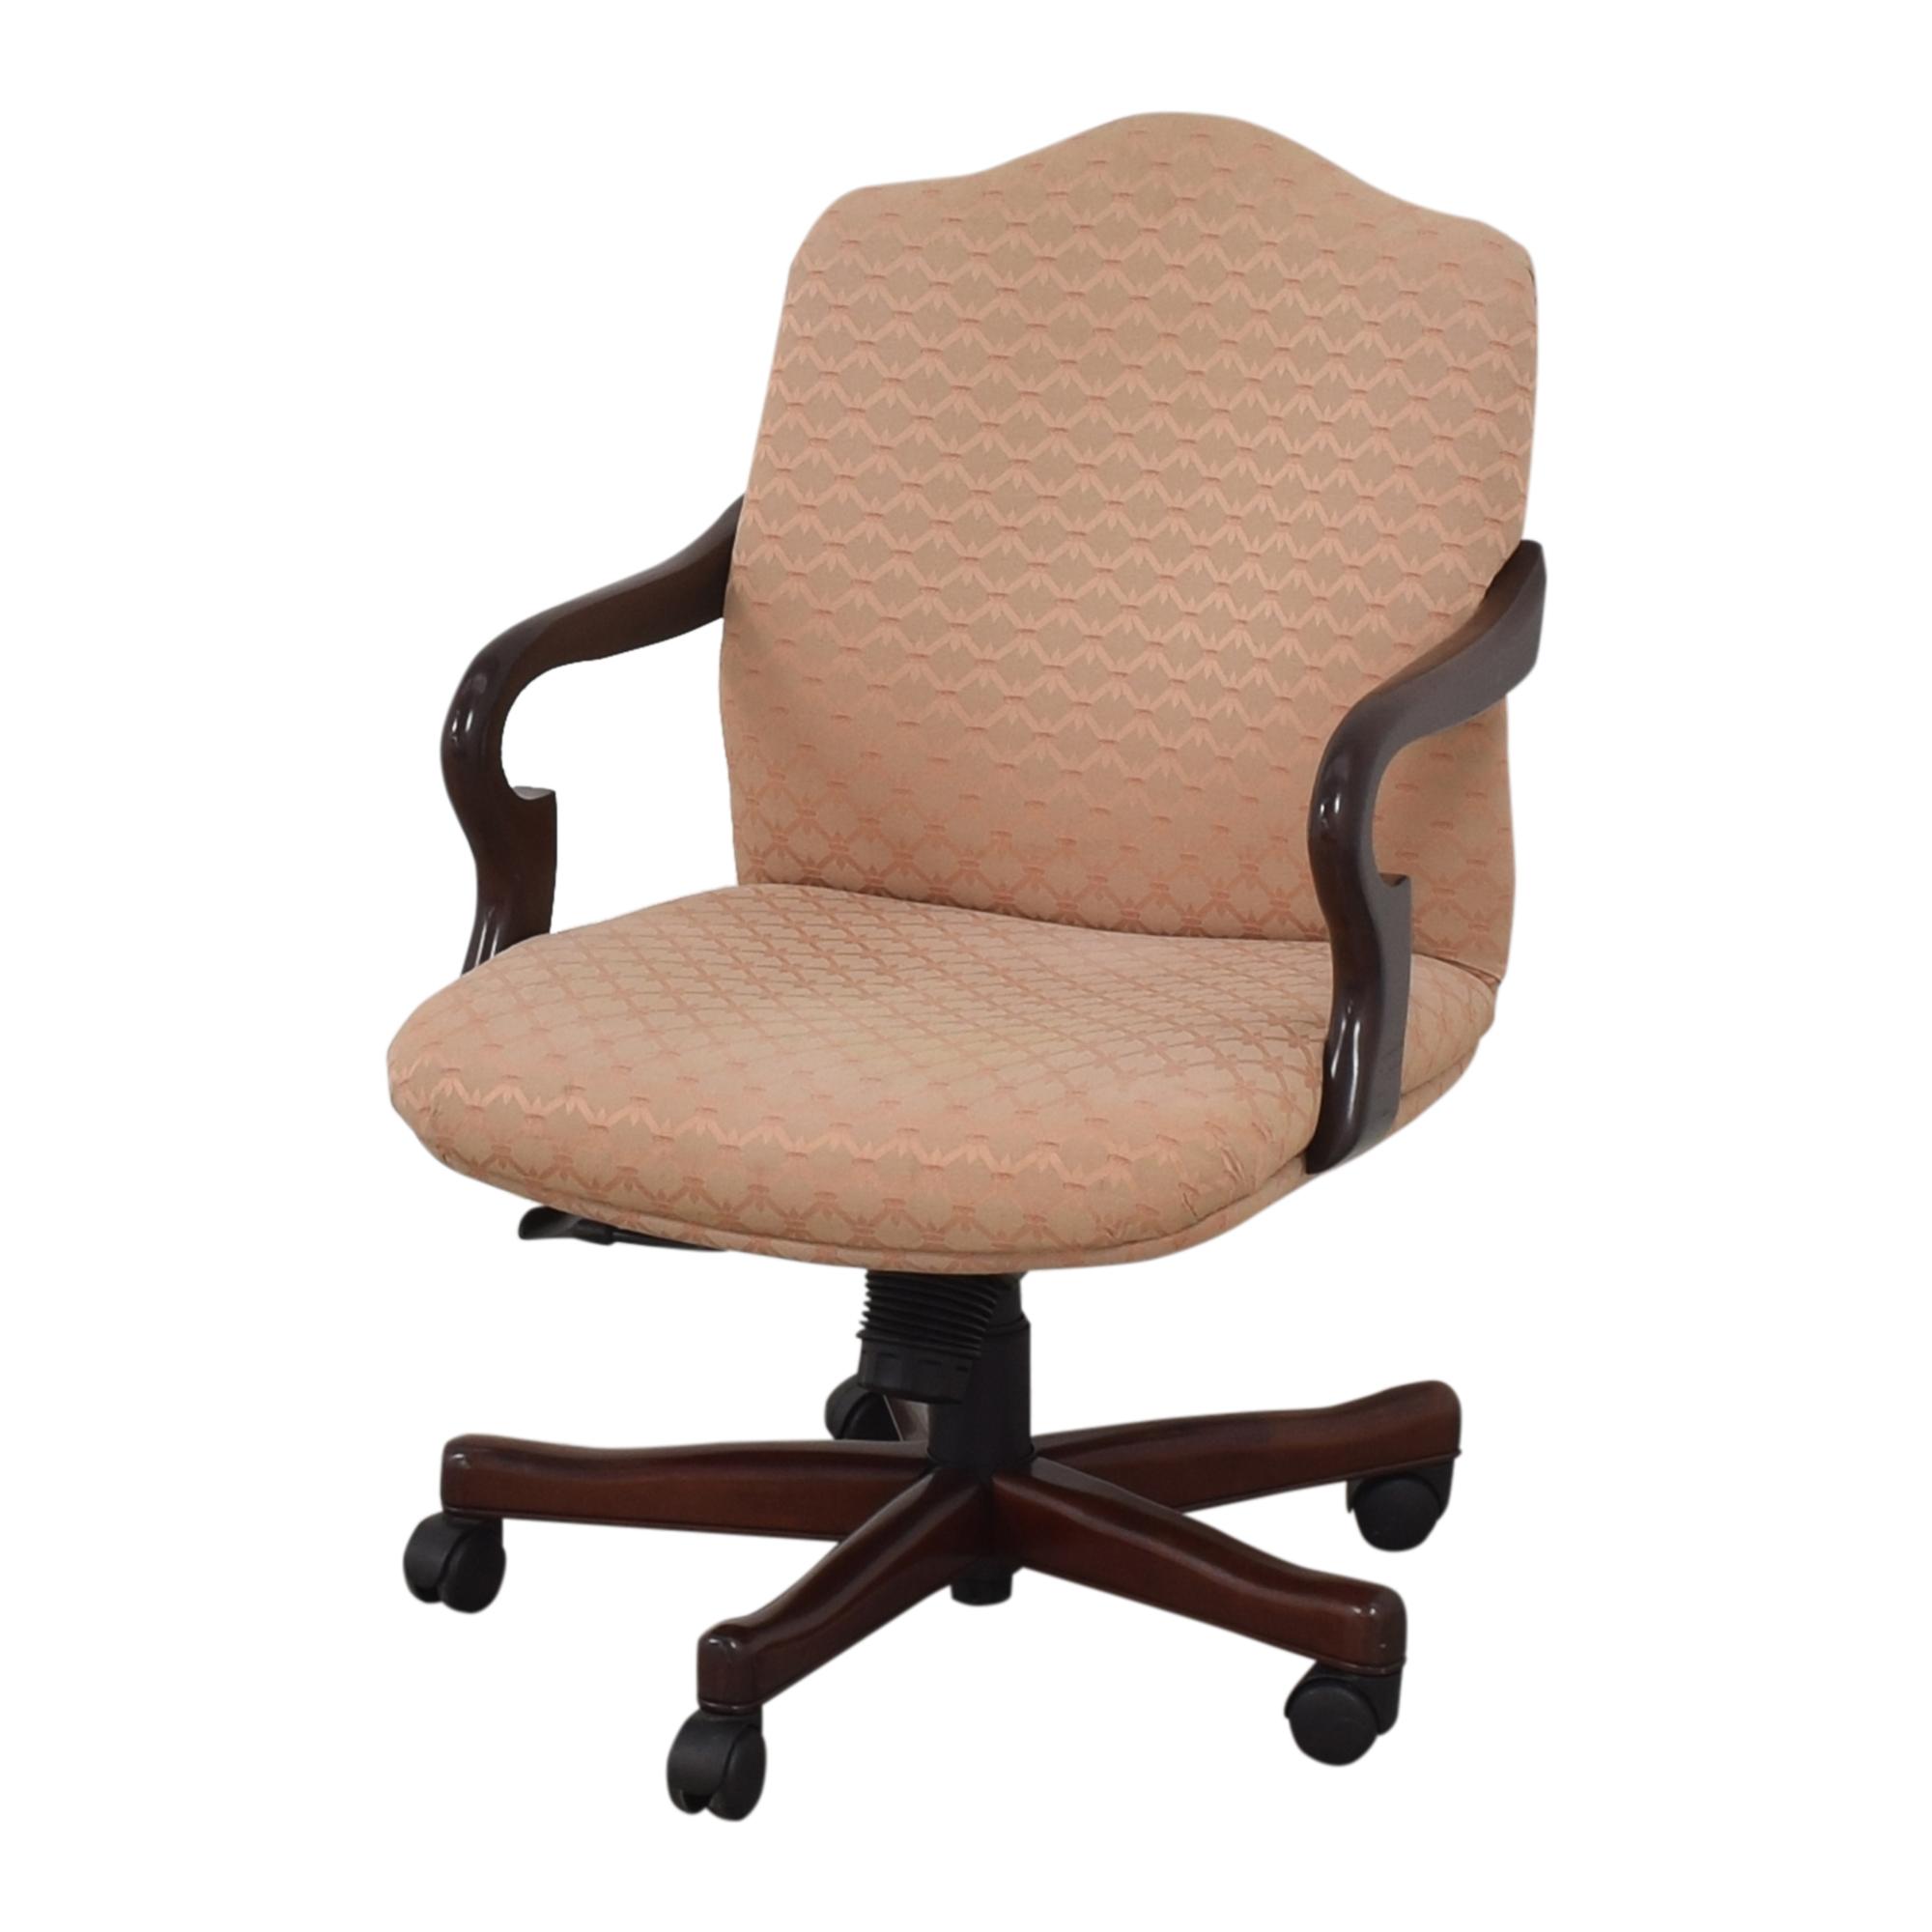 Jofco Jofco Swivel Tilt Office Chair nj